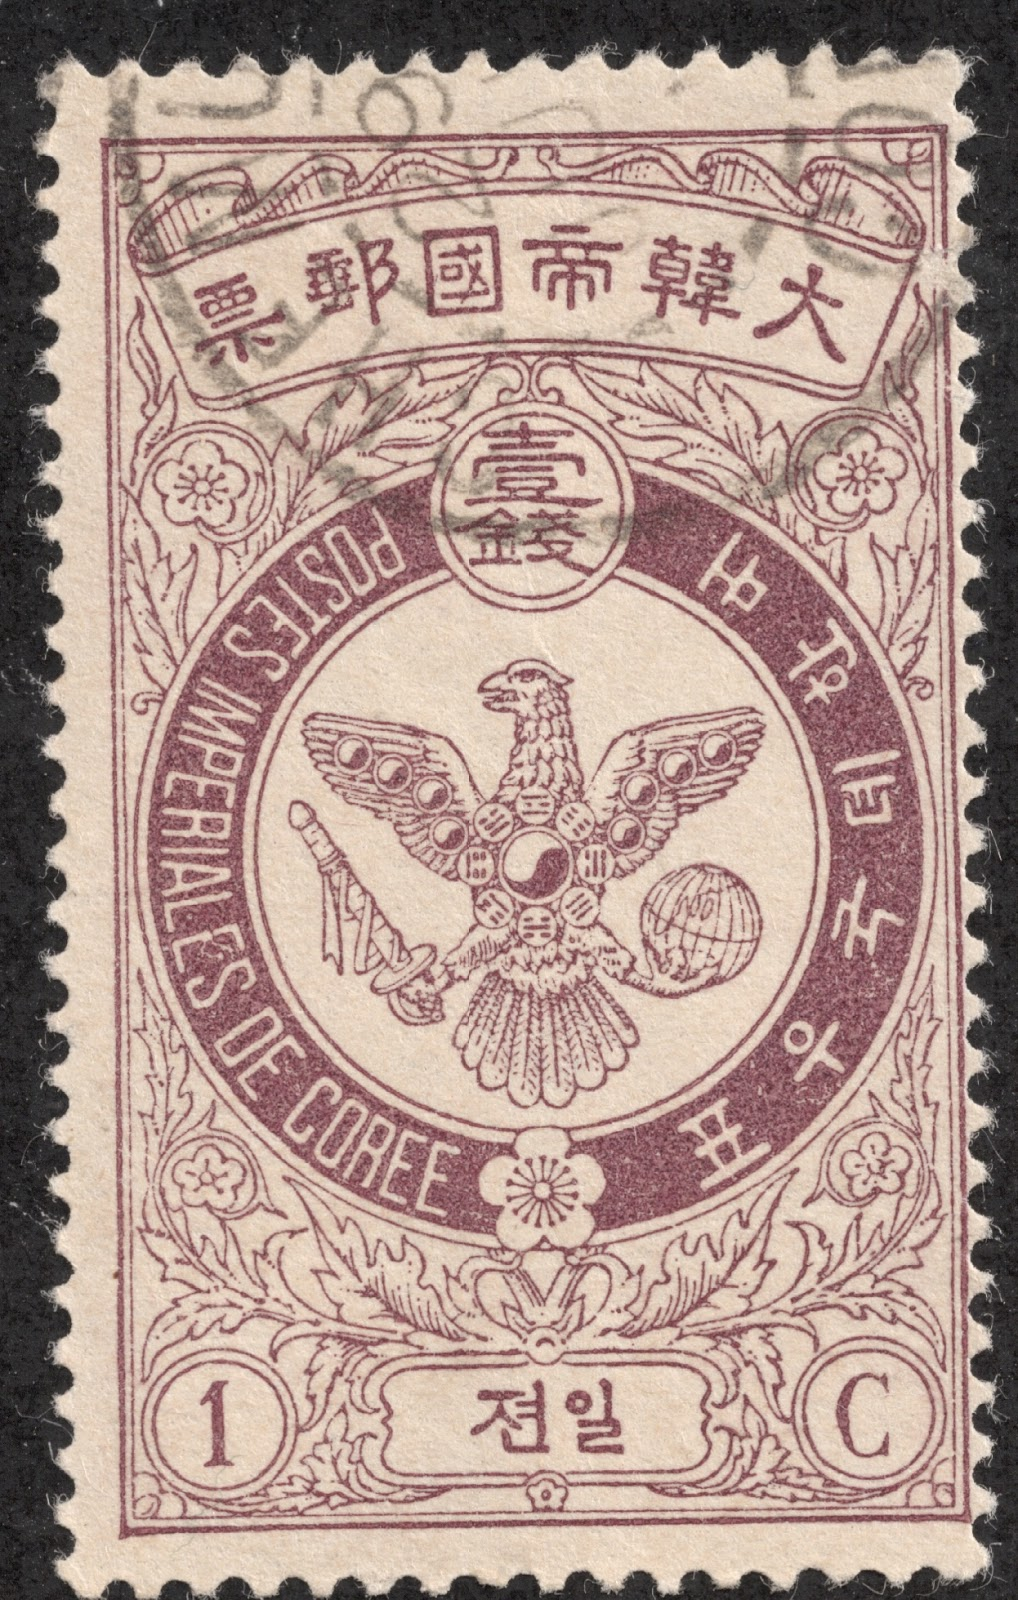 Empire of Korea : vexillology